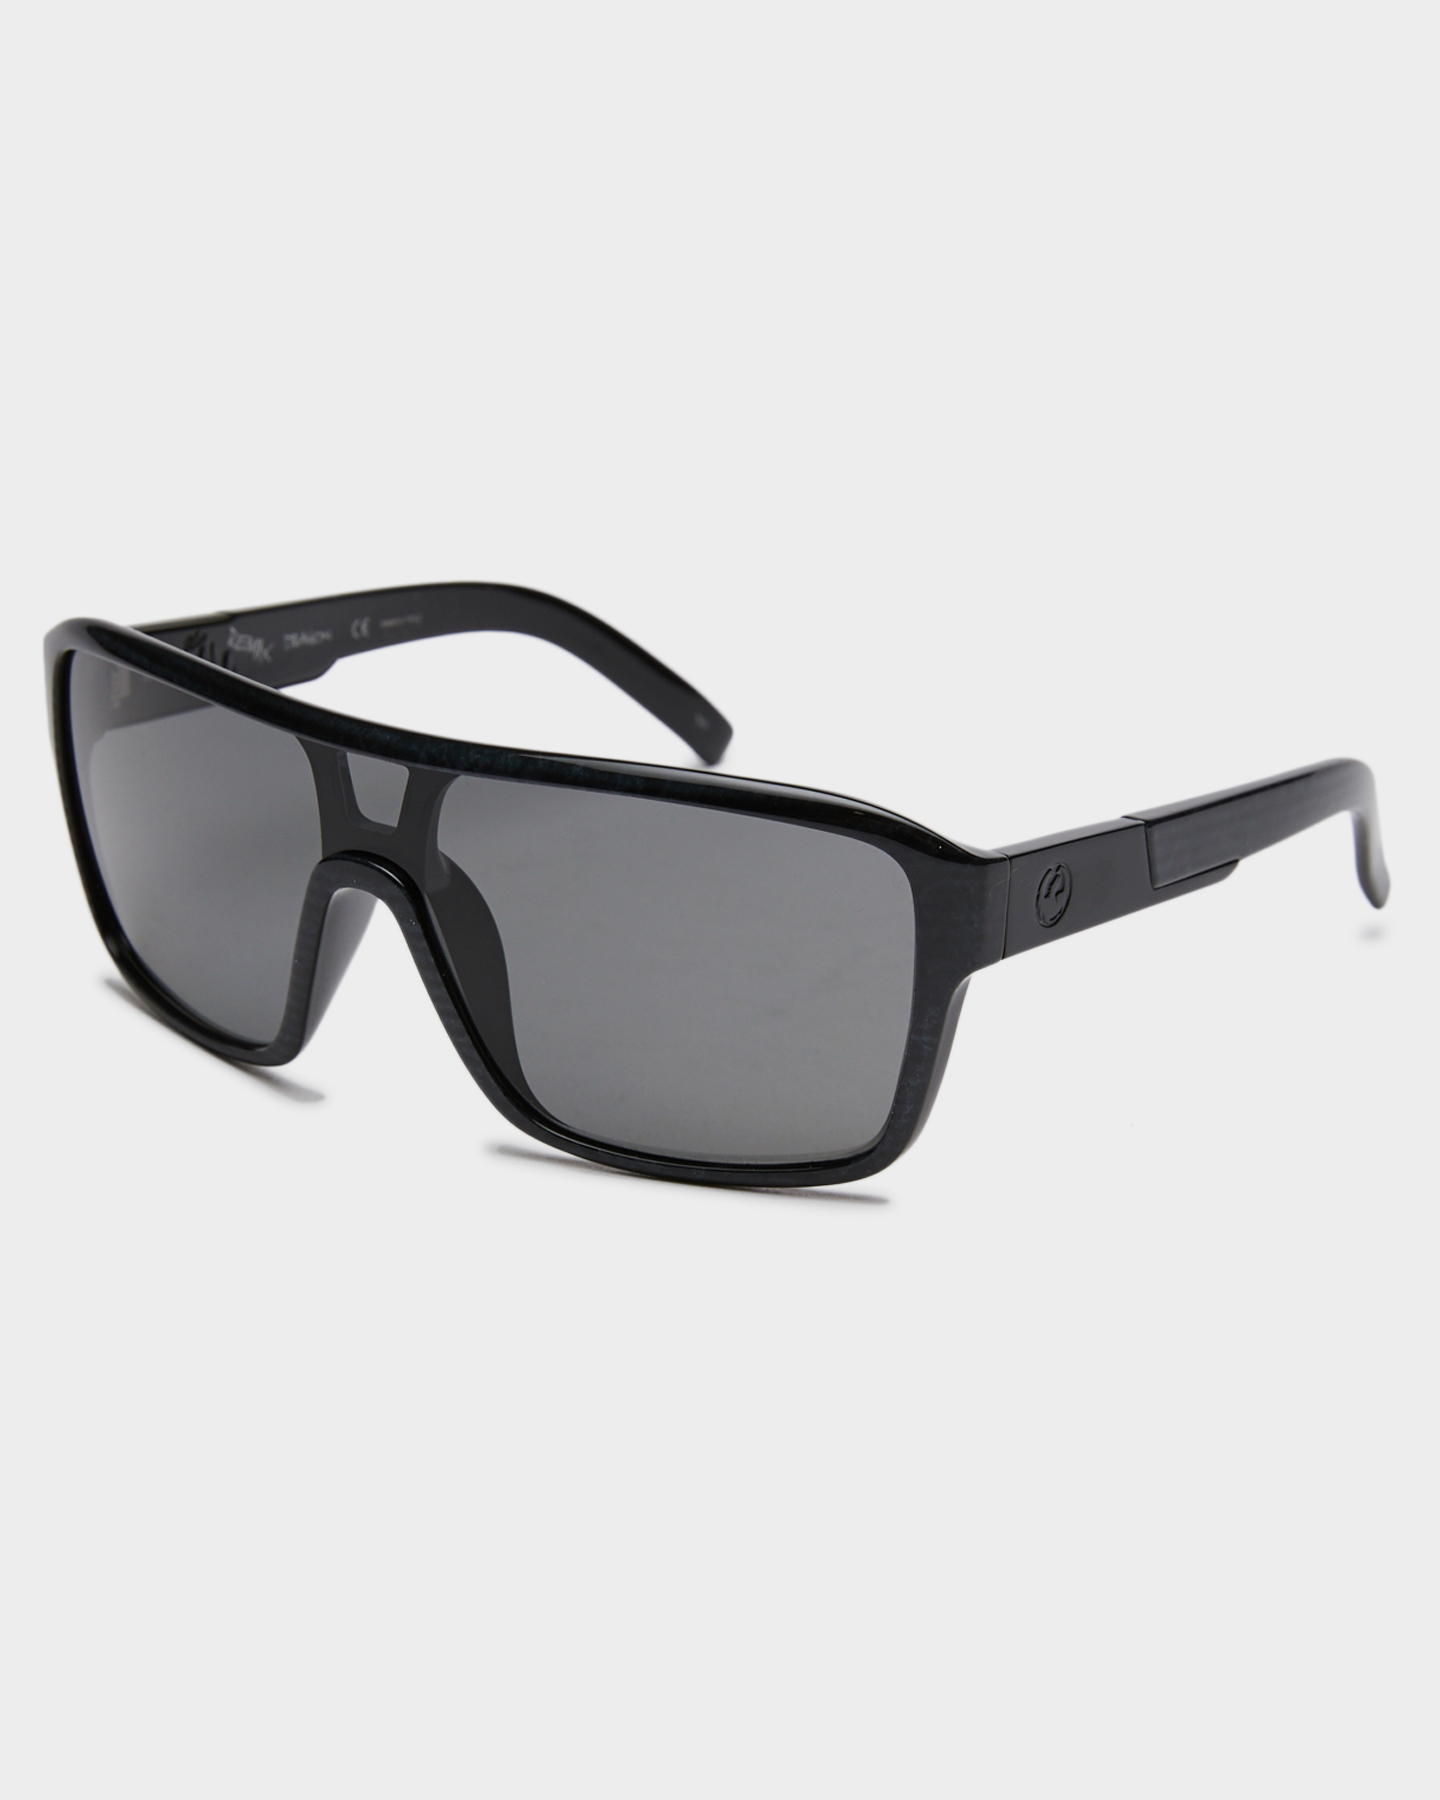 Dragon Remix Polarized Sunglasses Coal Smoke Coal Smoke